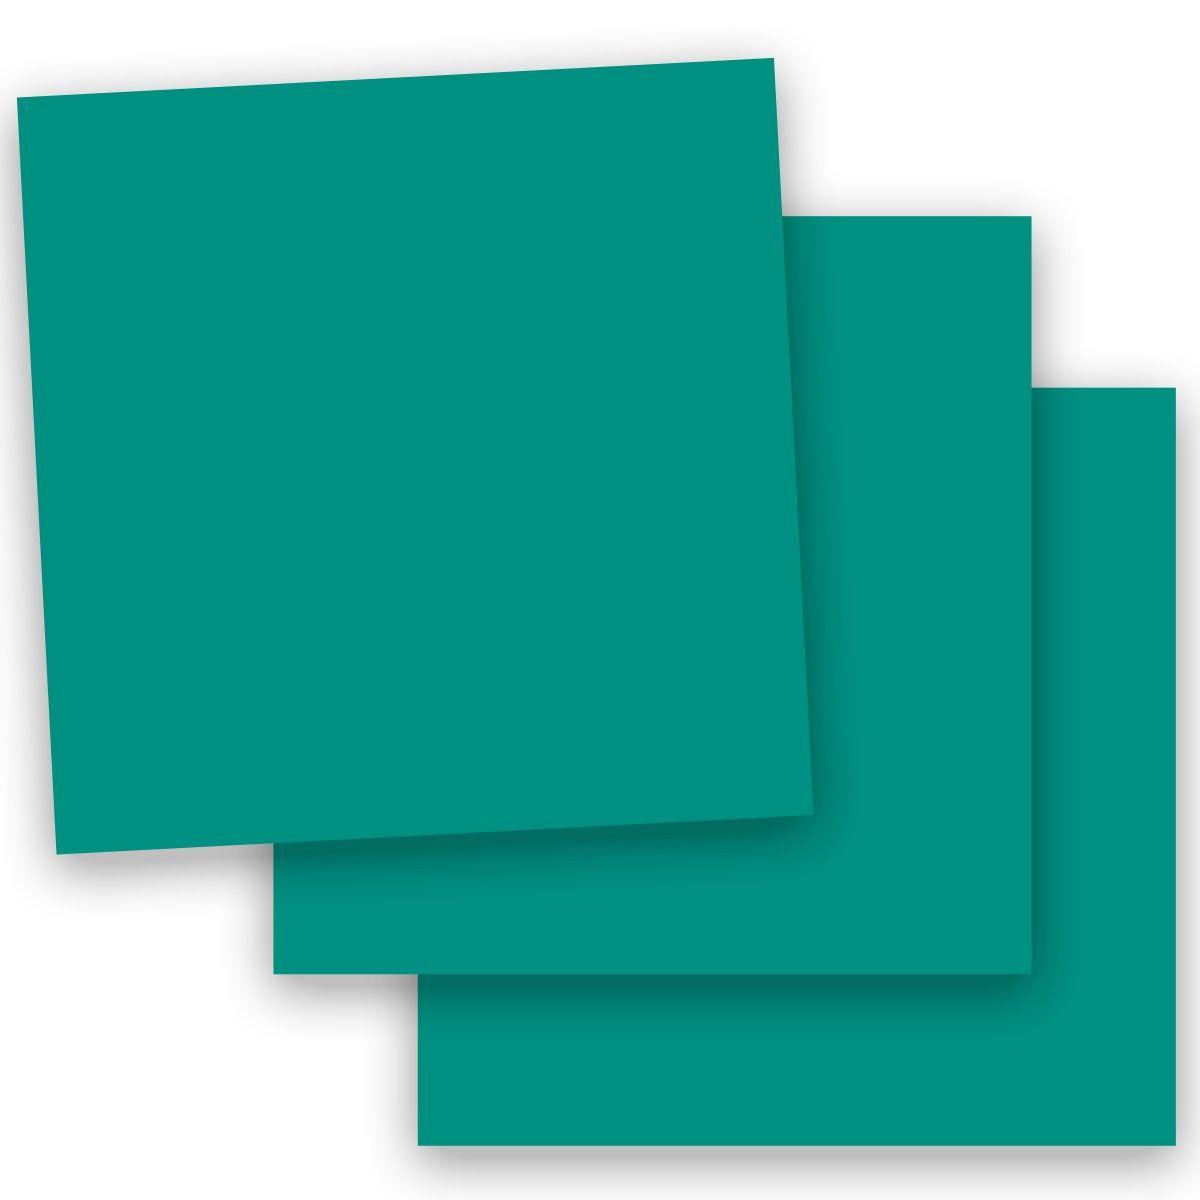 Curious Skin Emerald 12 X 12 Card Stock Paper 100lb Cover 50 Pk In 2020 Cardstock Paper Card Stock Paper